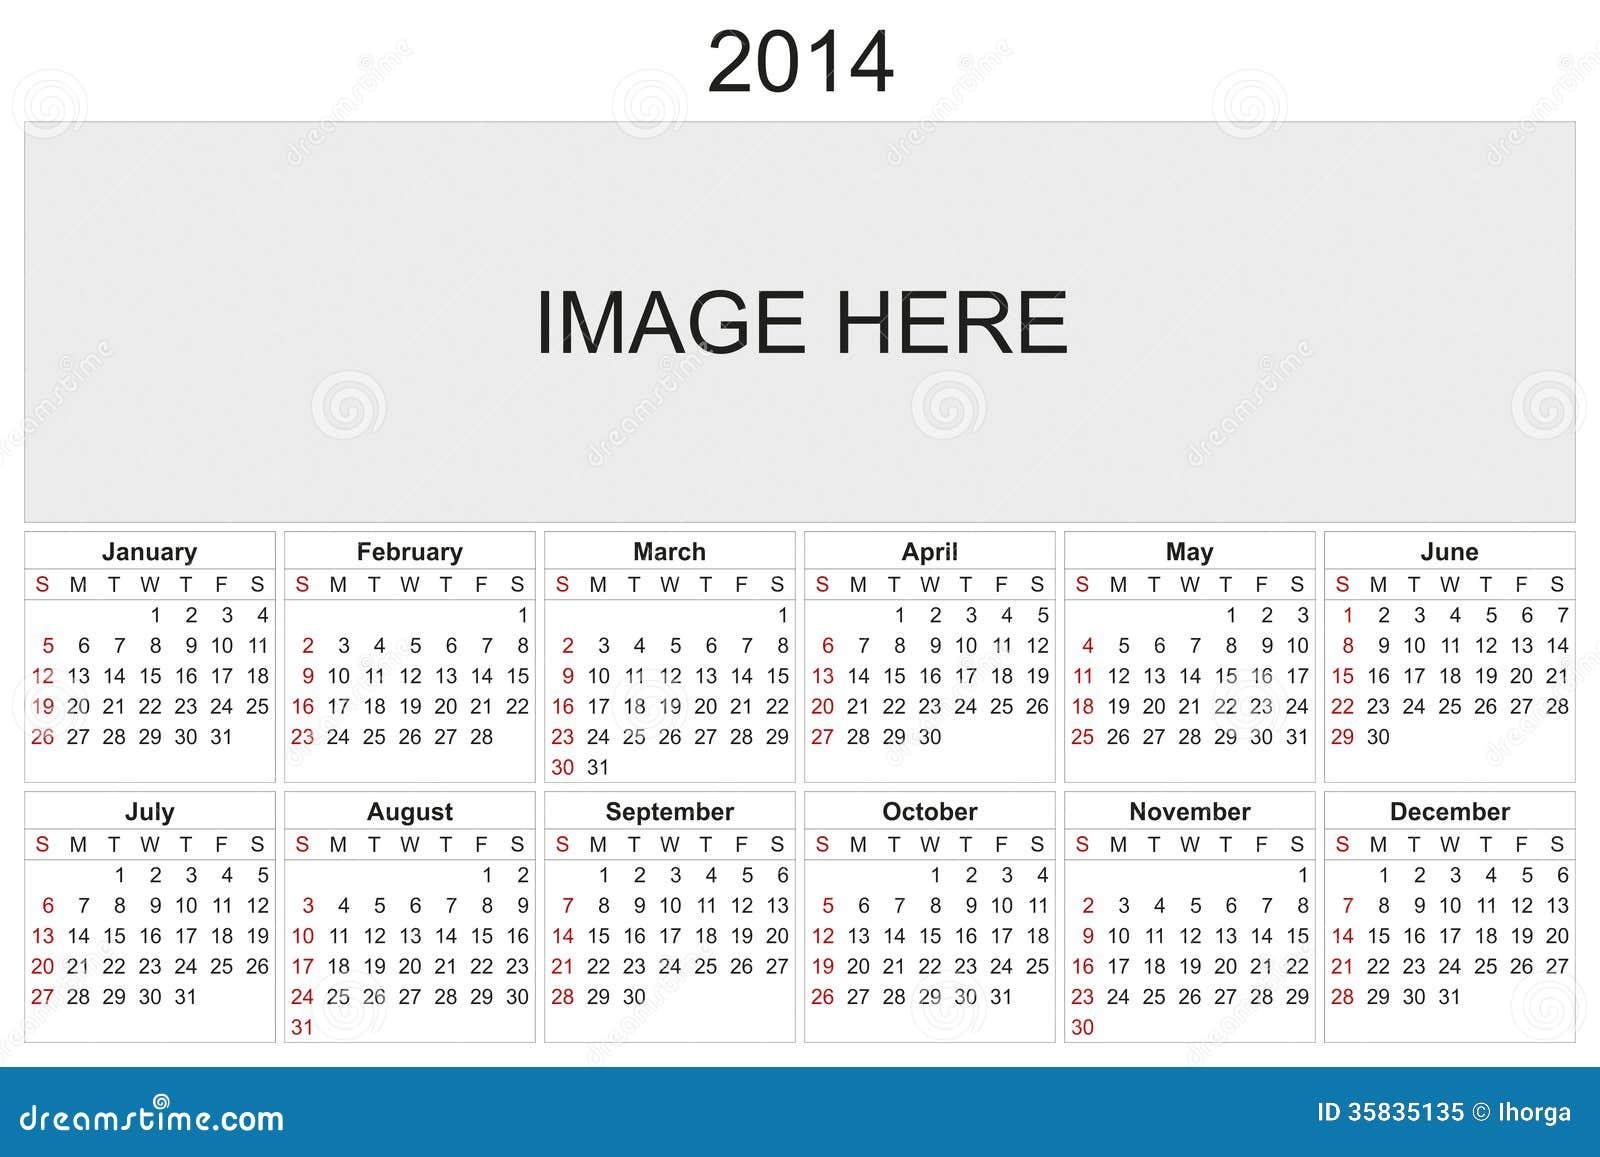 Calendar Design Using Photo : Calendar royalty free stock photo image